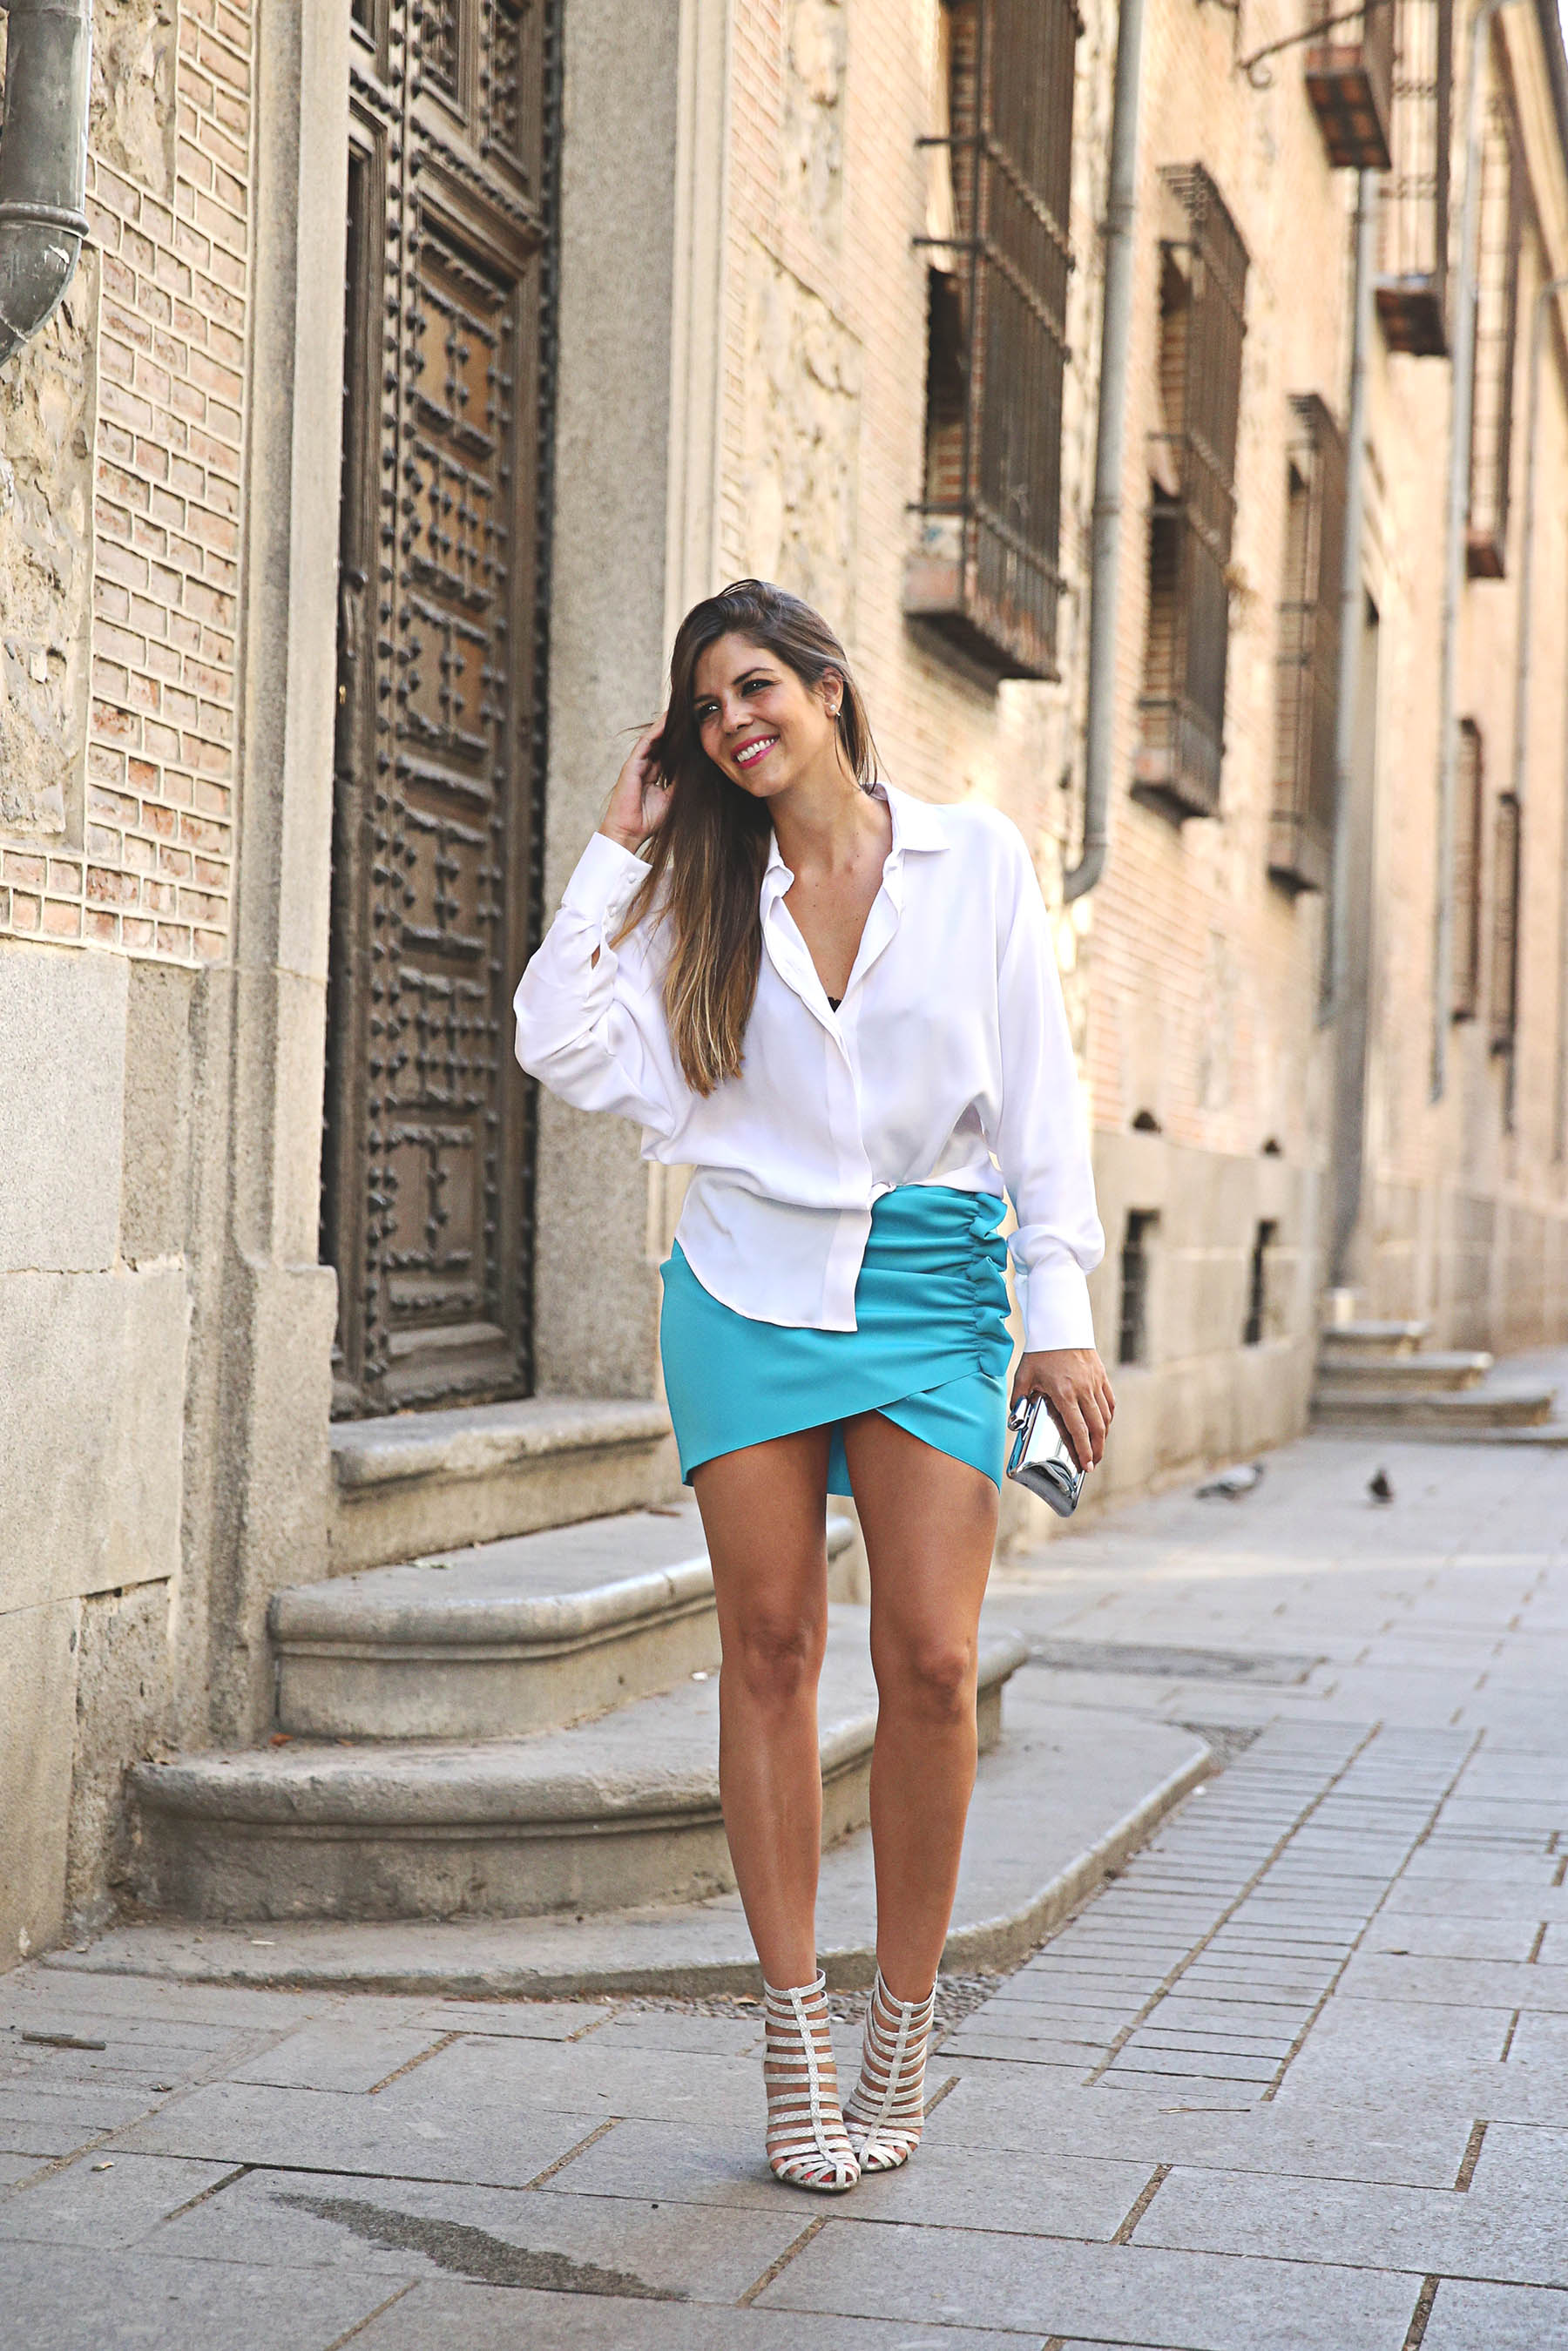 trendy-taste-look-outfit-street-style-ootd-blog-blogger-fashion-spain-moda-españa-lolali-blue-neopreno-azul-falda-blusa-bcbg-338-sandalias-serpiente-5